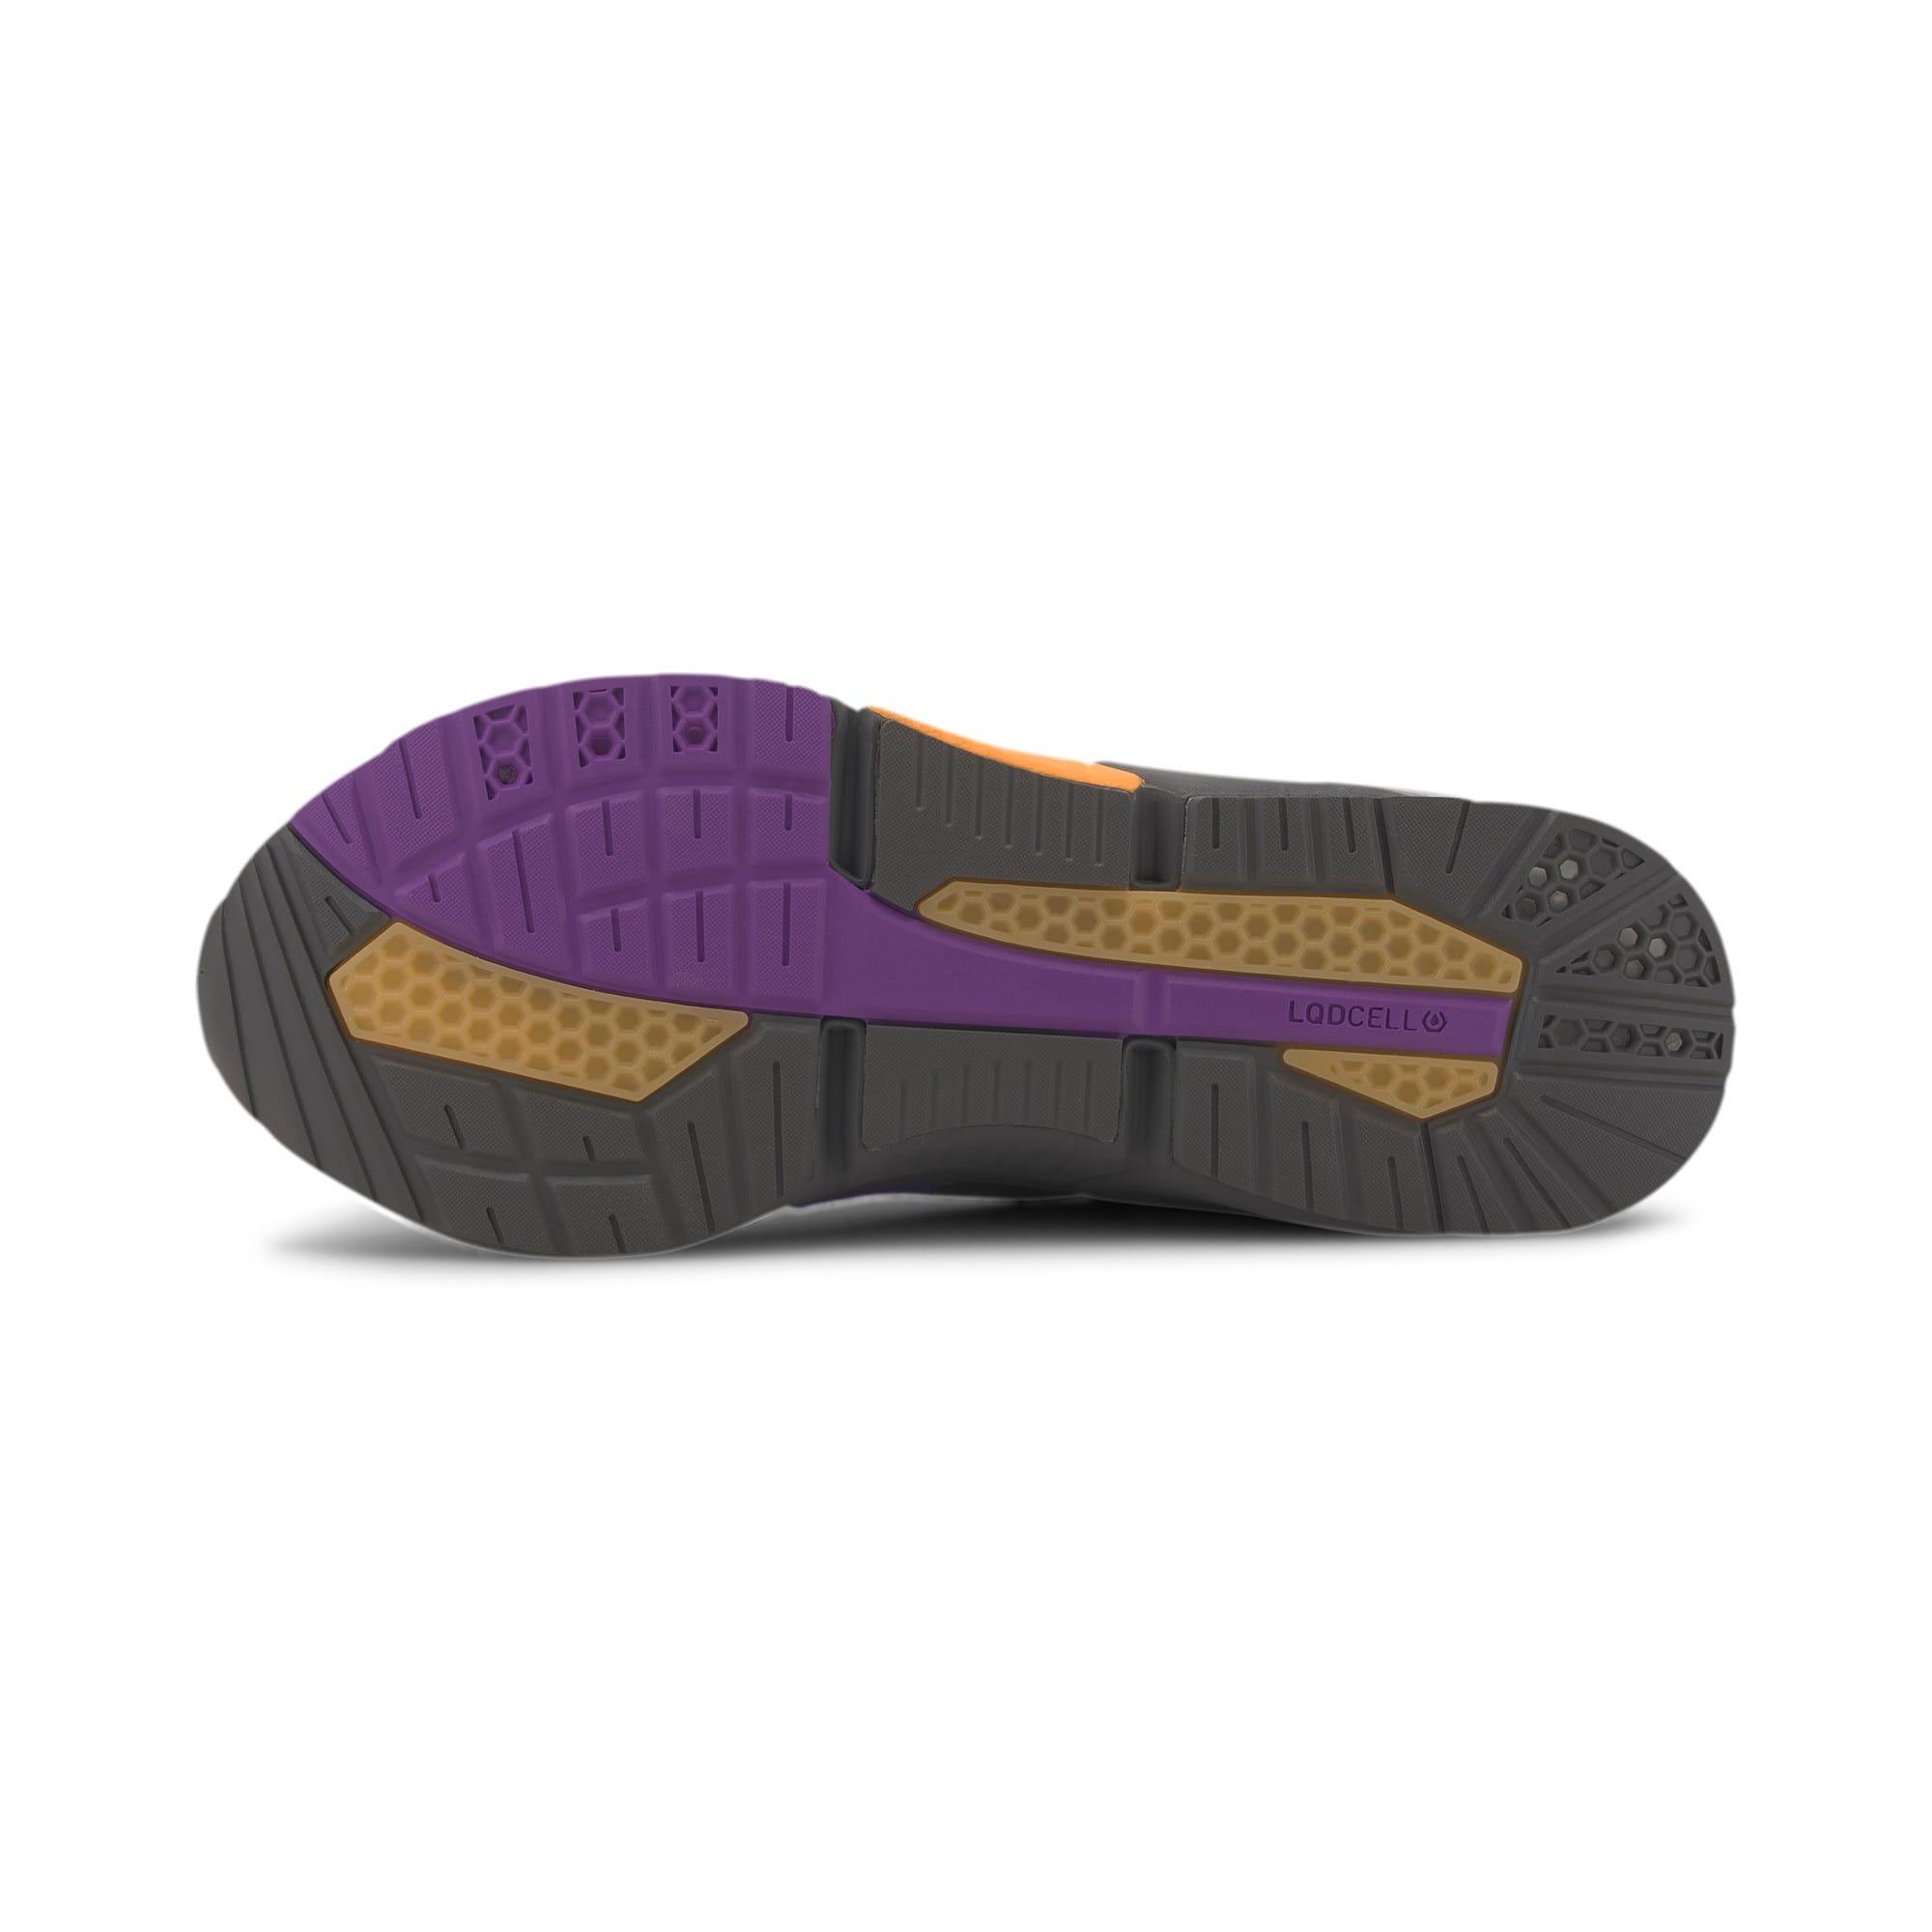 Thumbnail 4 of LQDCELL Optic Rave Men's Running Shoes, CASTLEROCK-Purple Glimmer, medium